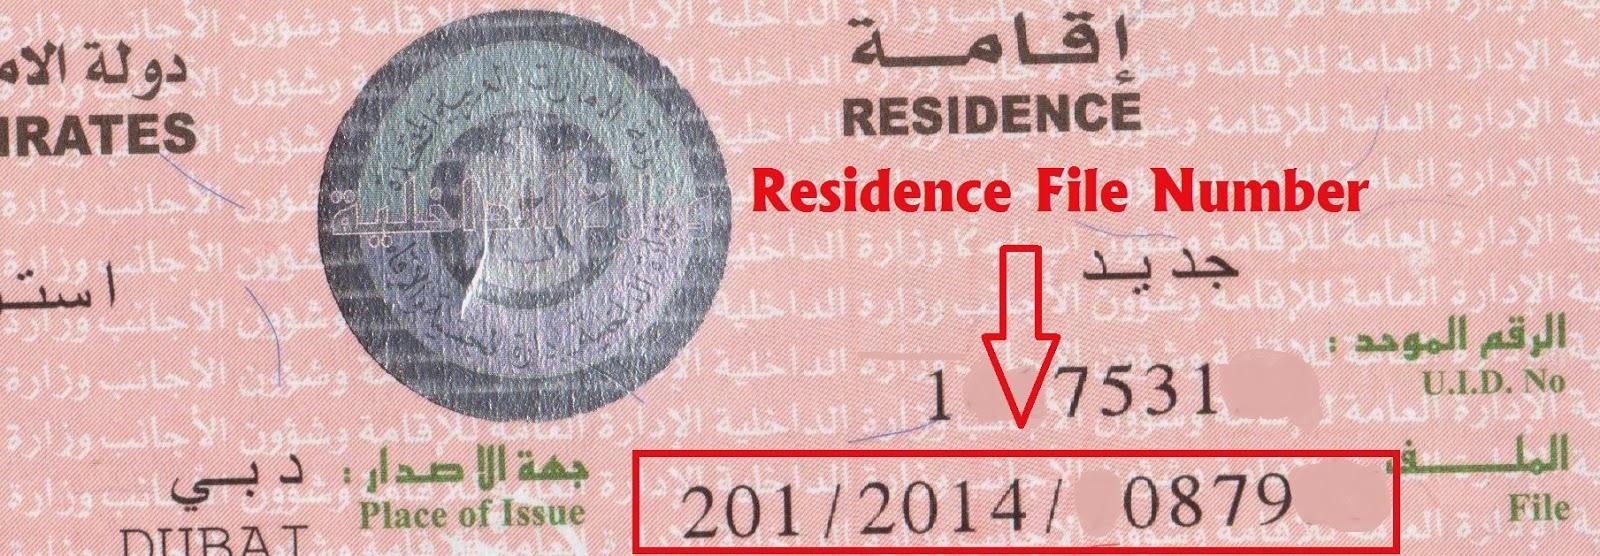 American visa status check dubai